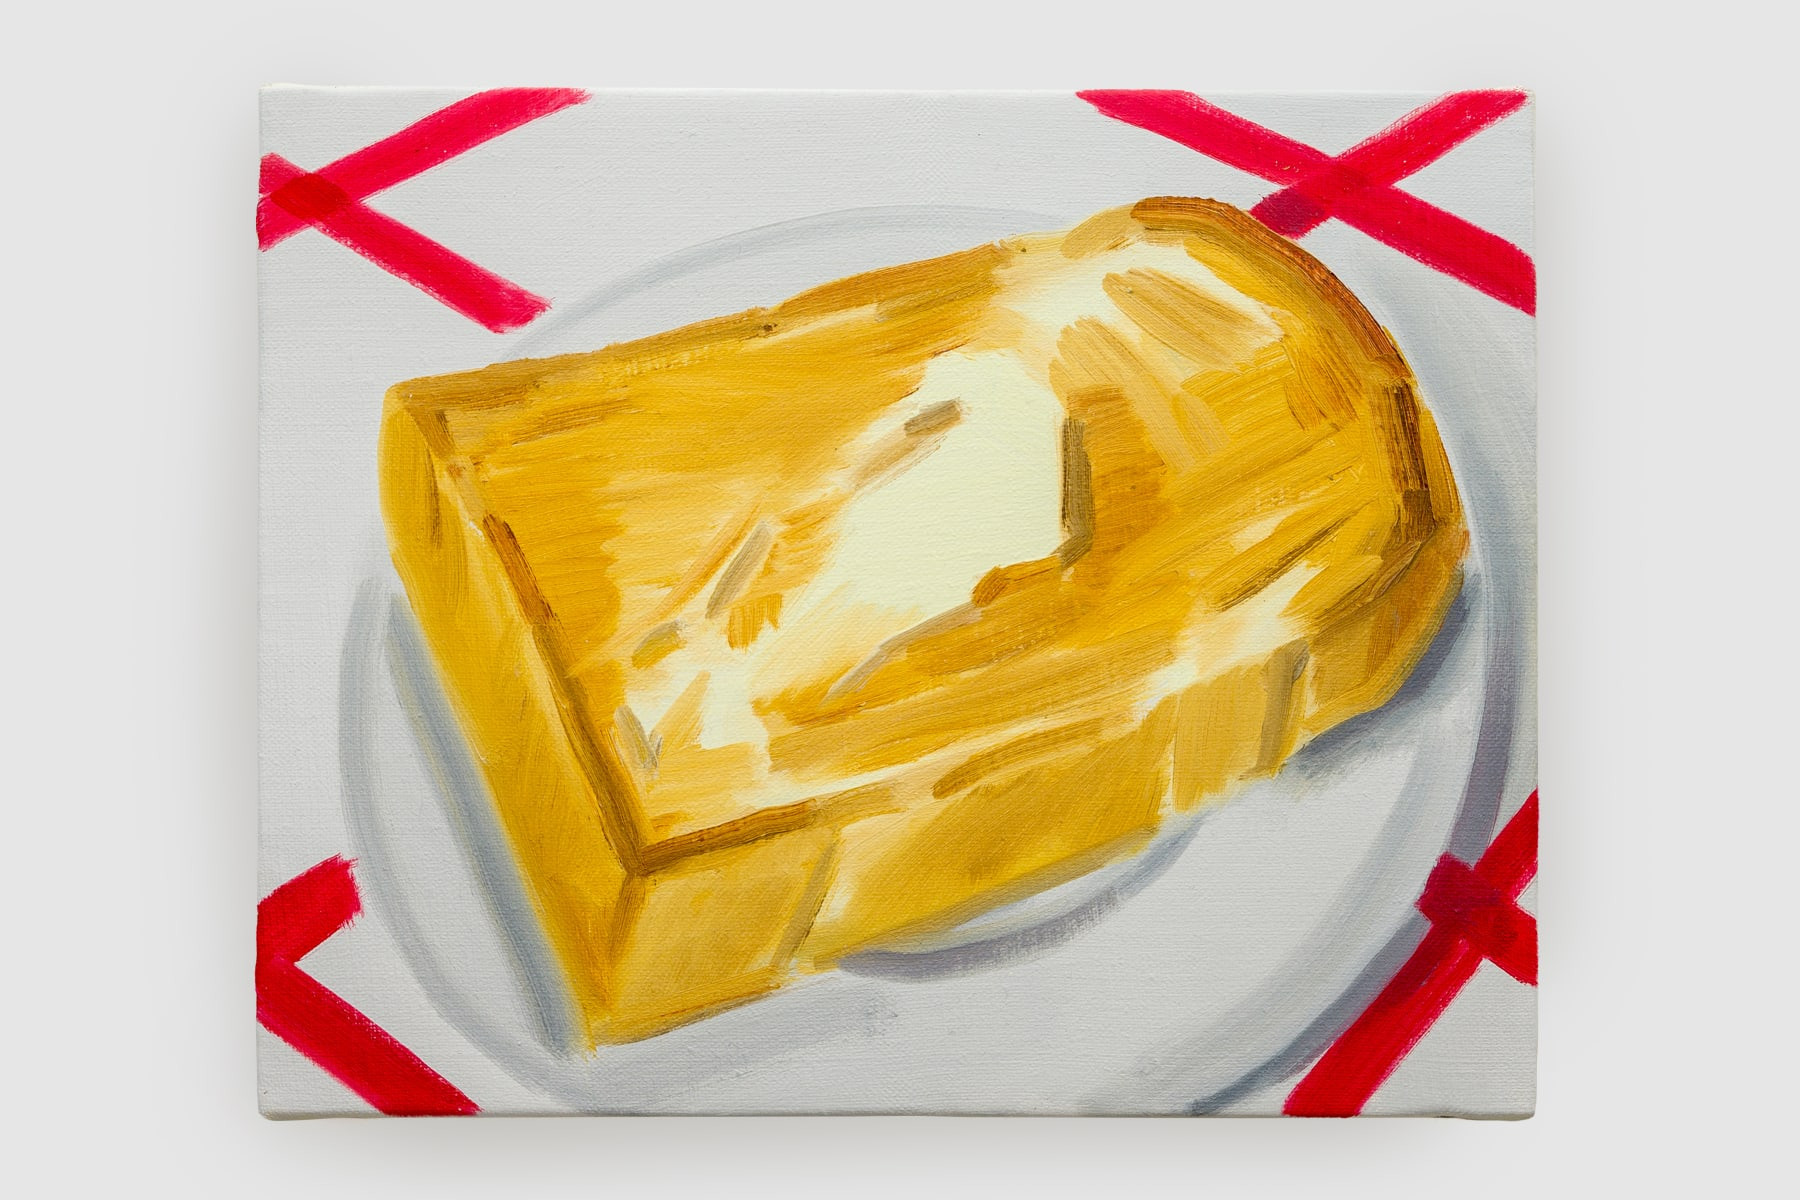 Ulala Imai, Butter Toast, 2021